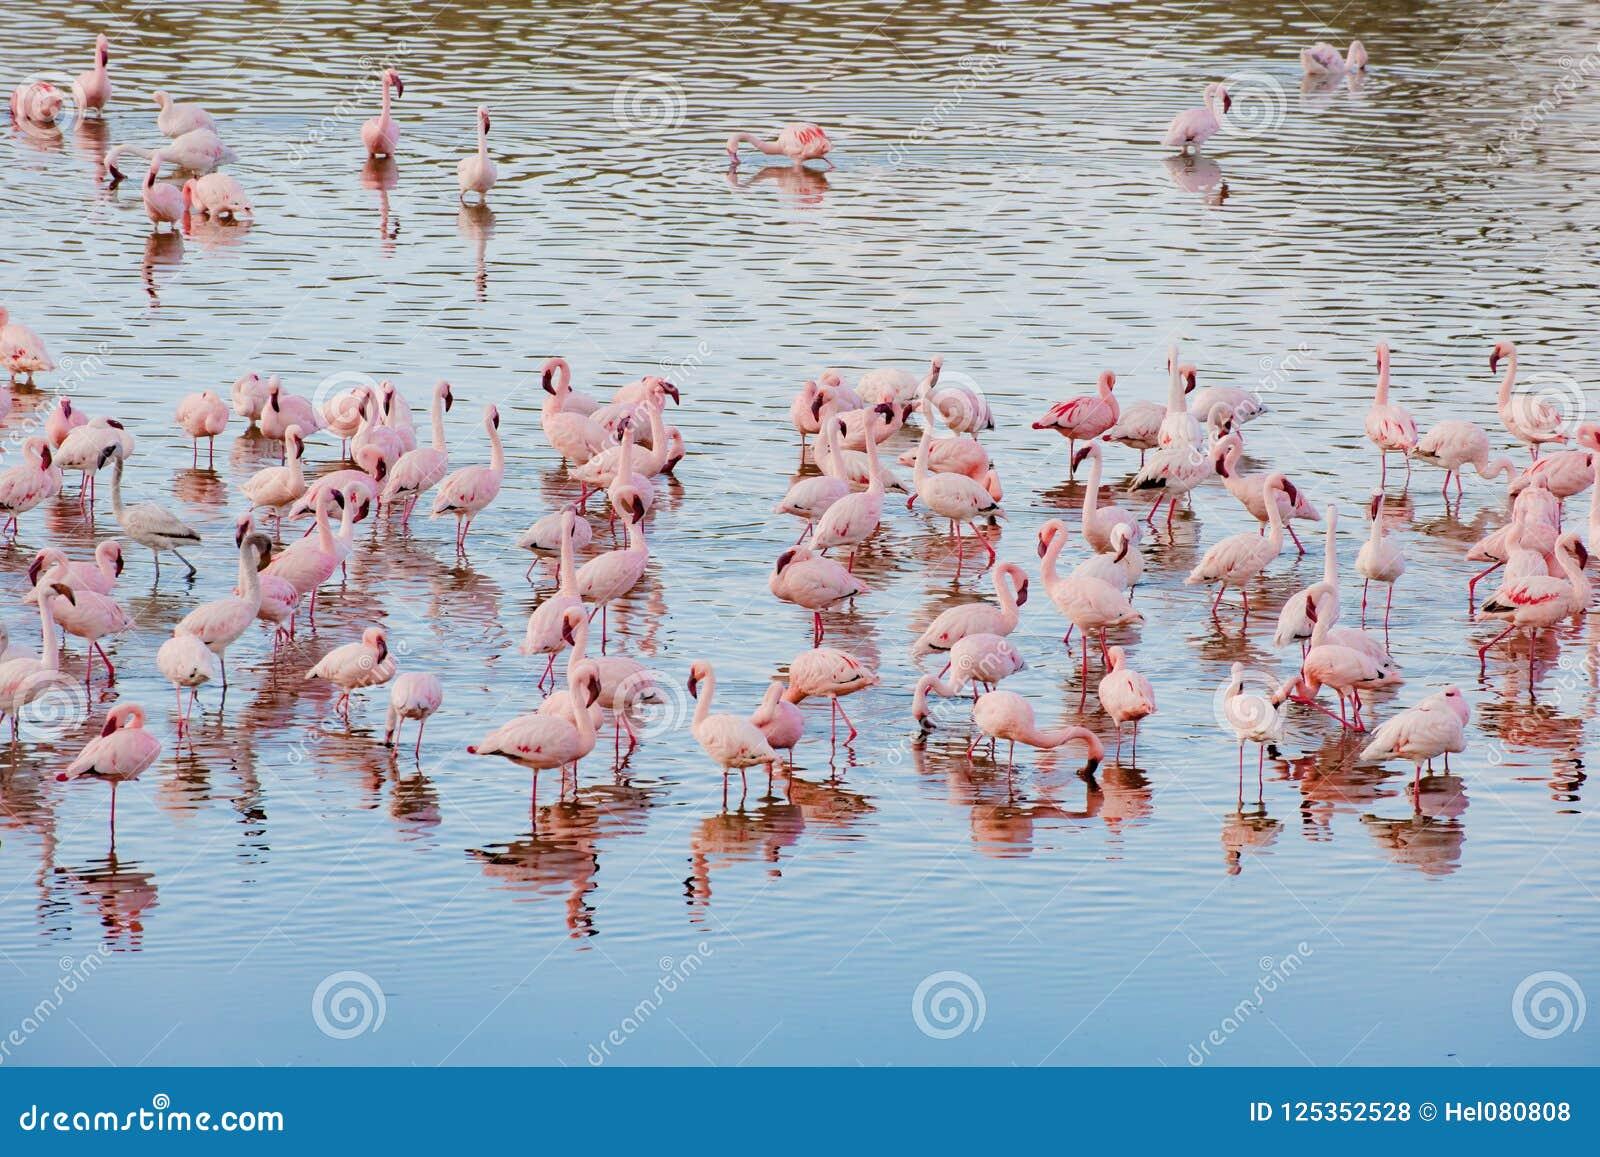 Flamingos in Momela Lake, Arusha National Park, Tanzania